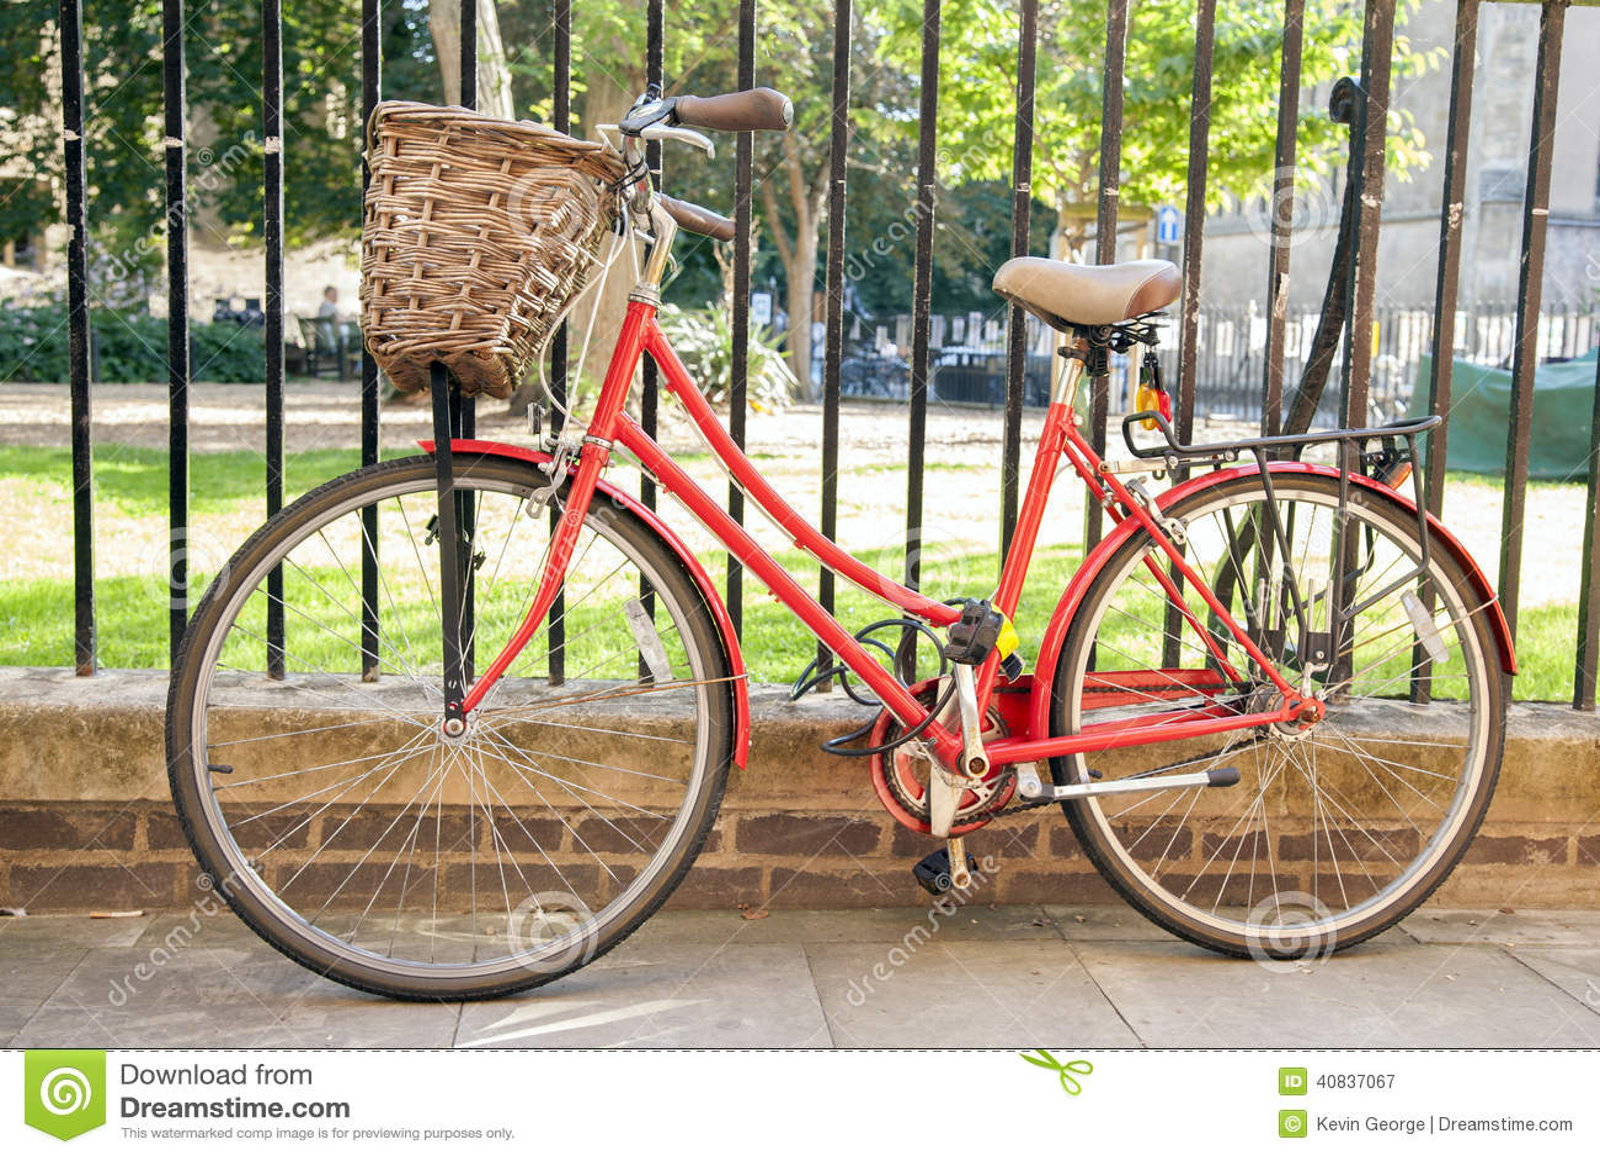 Red Bike in Cambridge